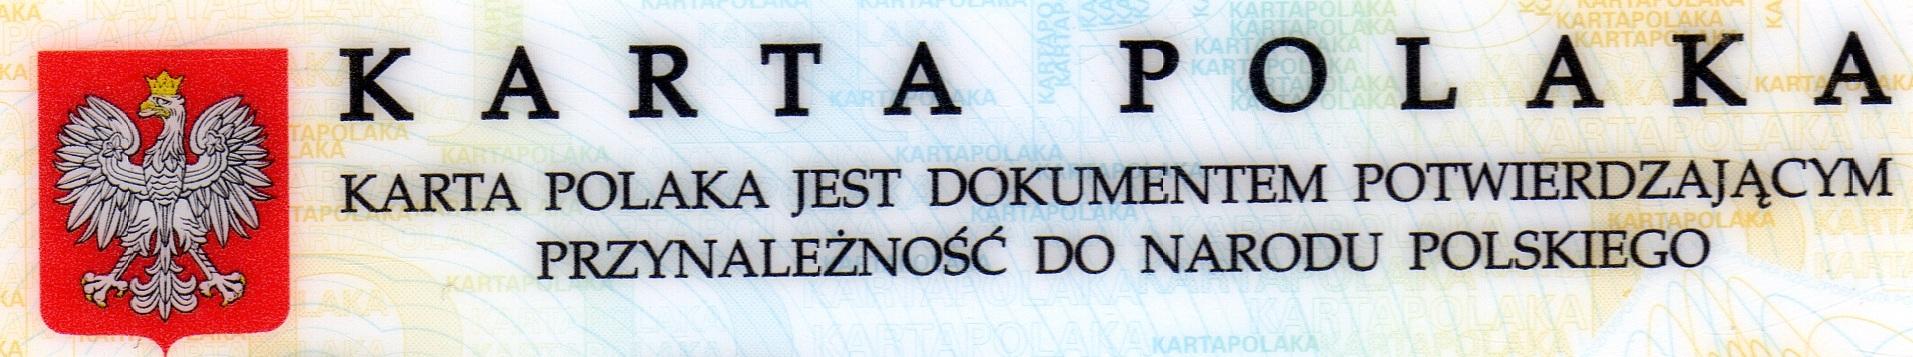 Karta-Polaka-viza.vn_.ua_1